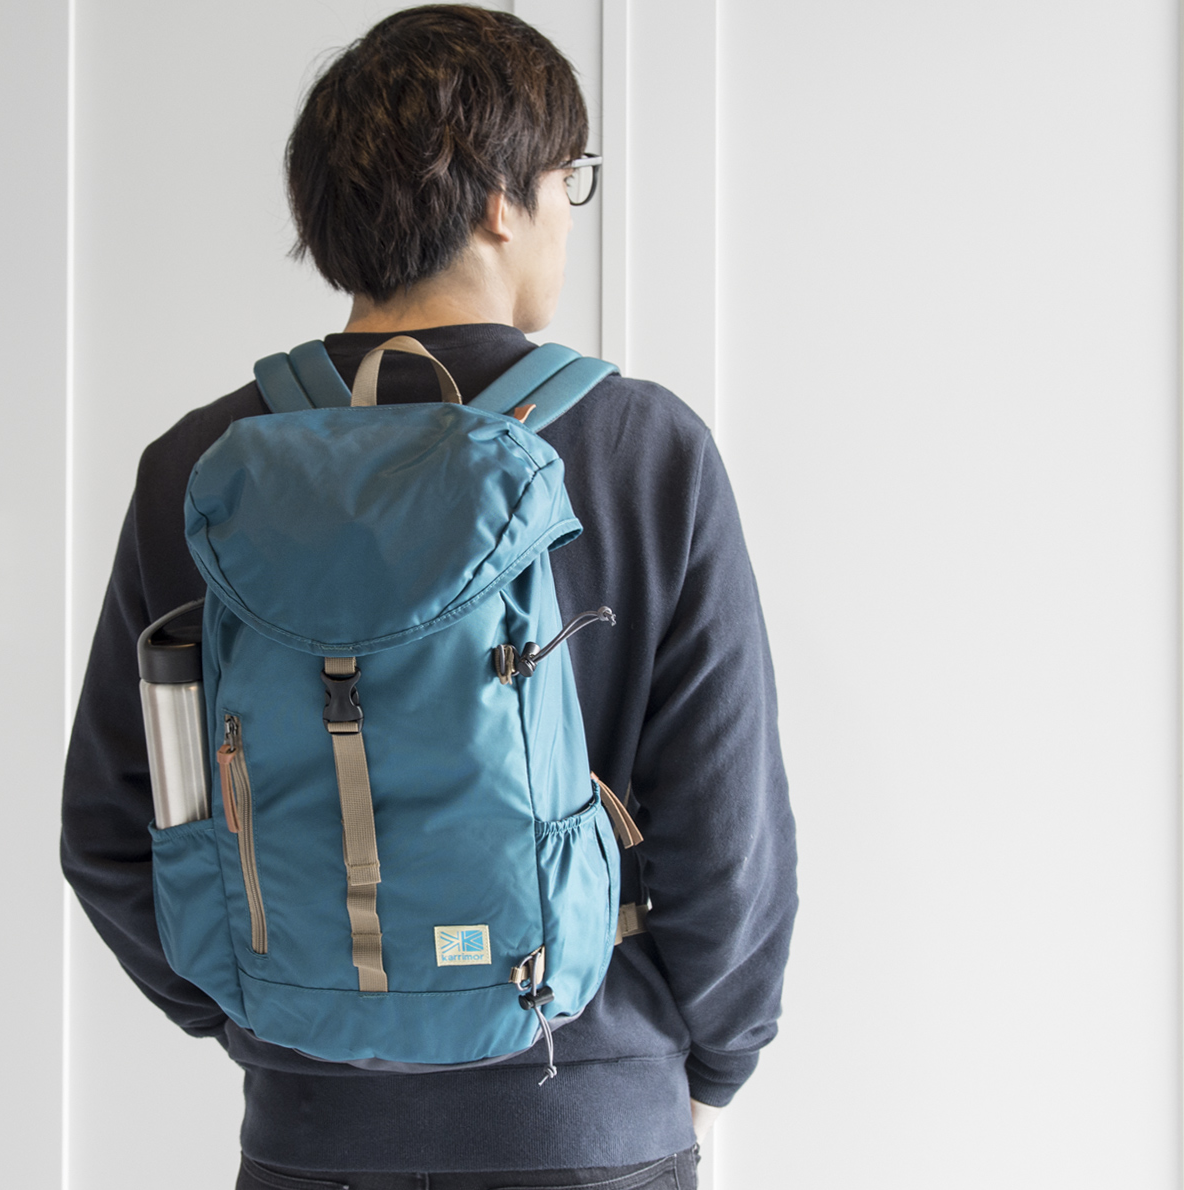 f:id:thebackpack:20190829190307p:plain